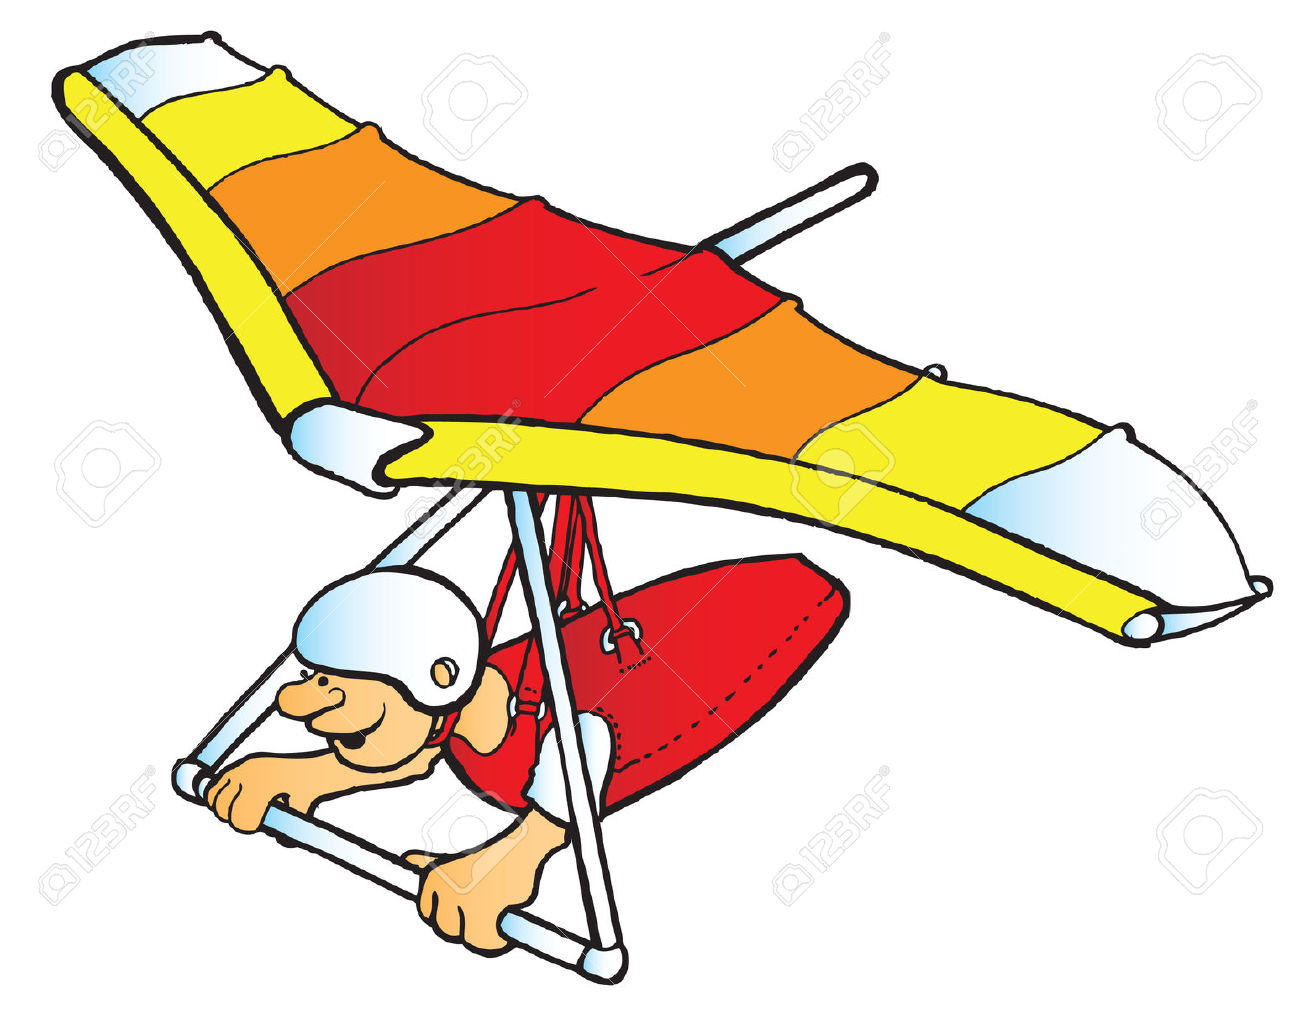 Hang gliding clipart.